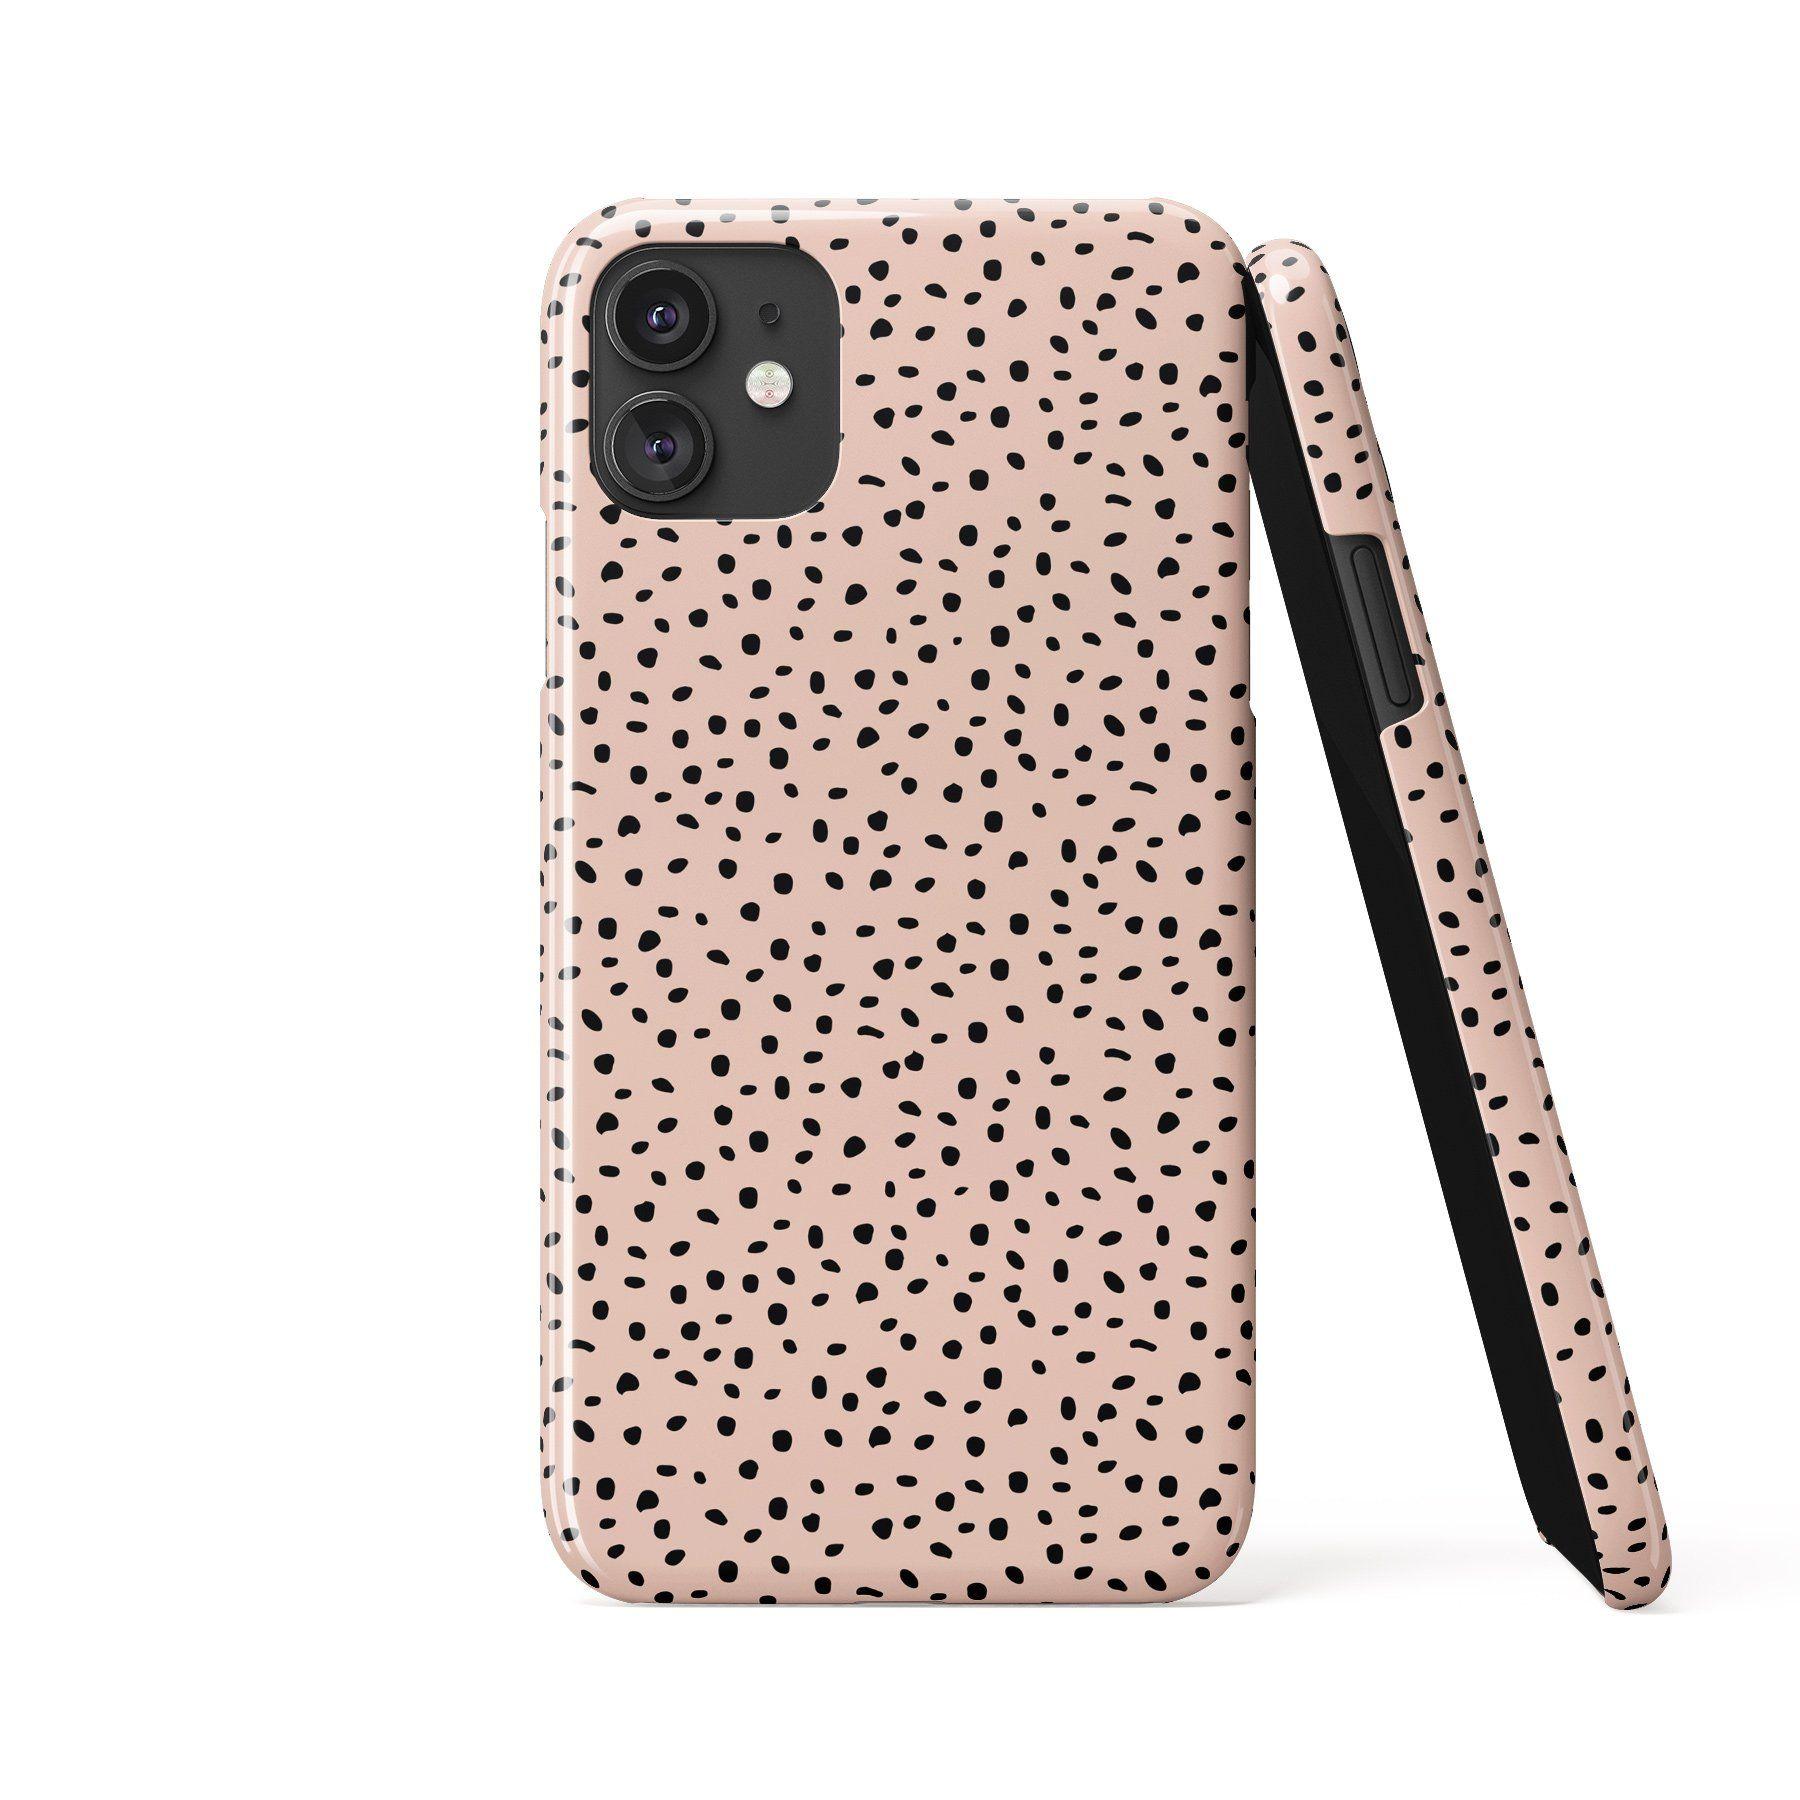 ALINA POLKA DOTS Light Pink Phone Case - iPhone X / Tough Case - Gloss